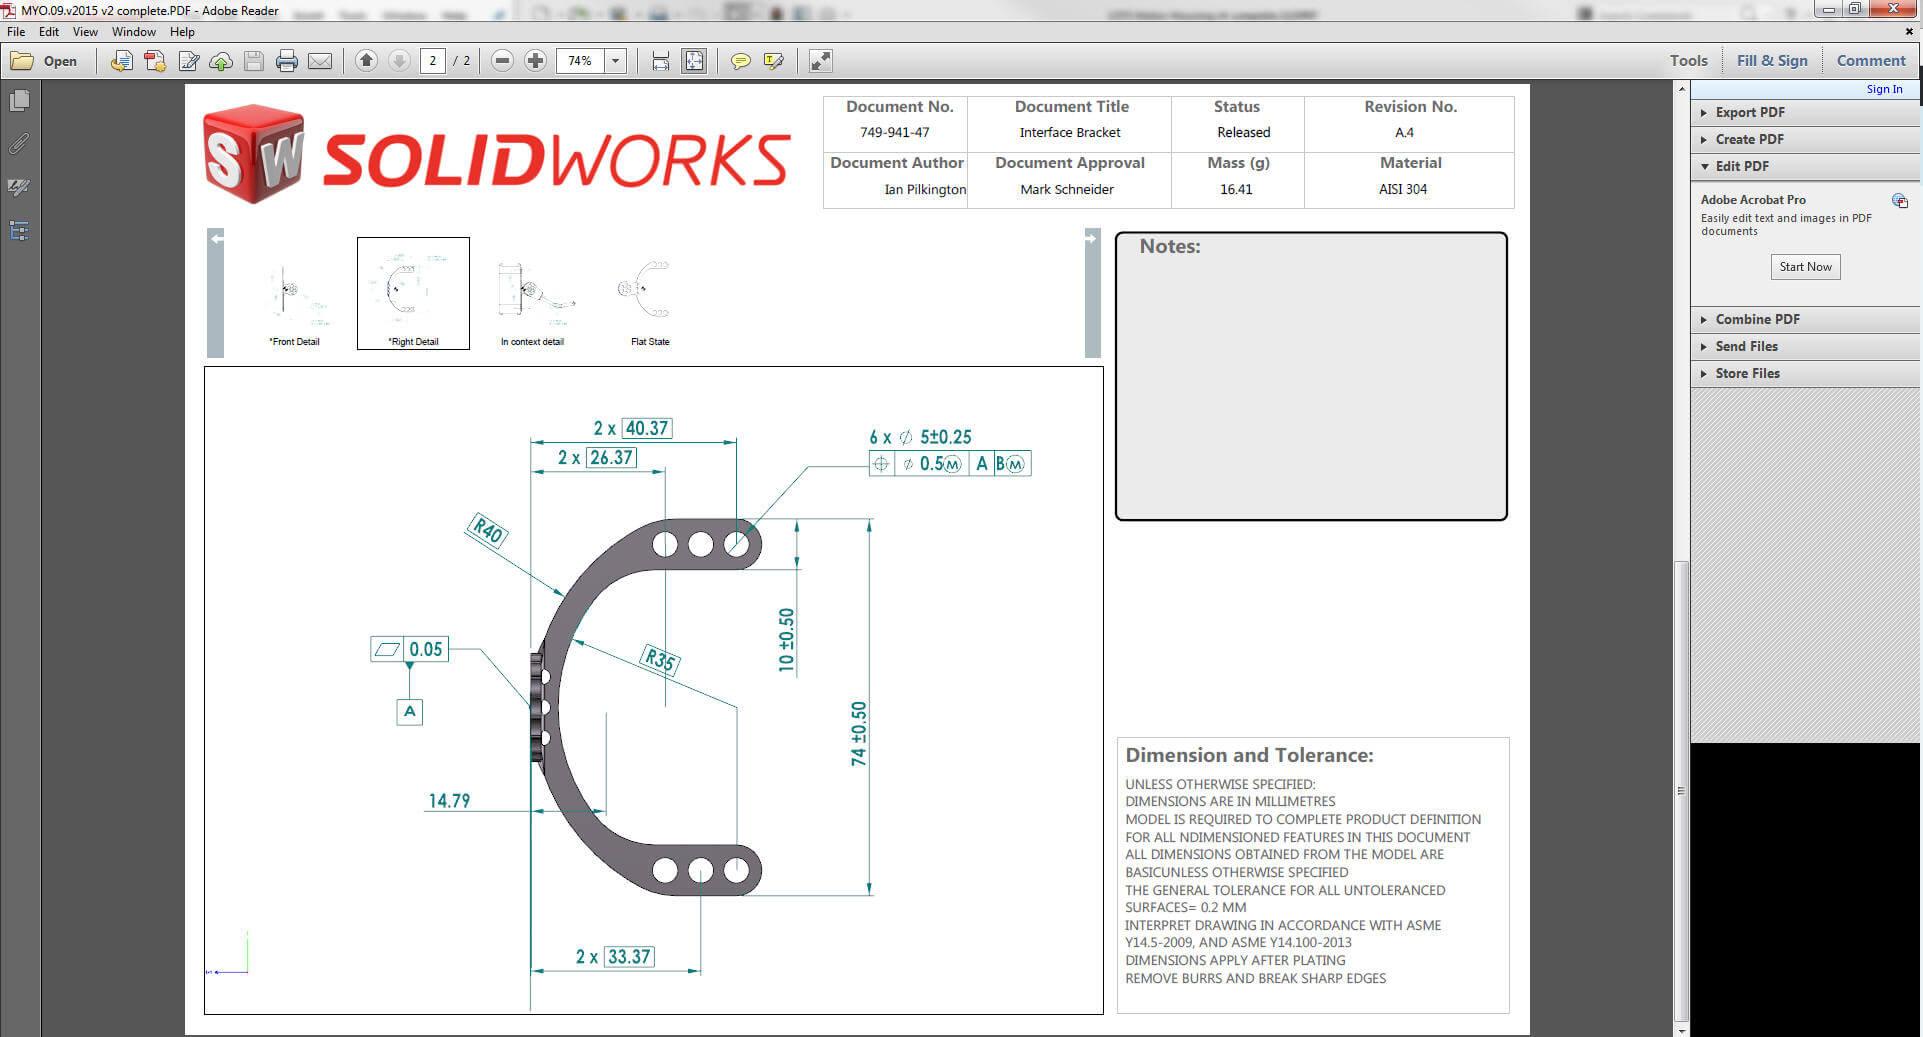 SOLIDWORKS MDB PDF Output